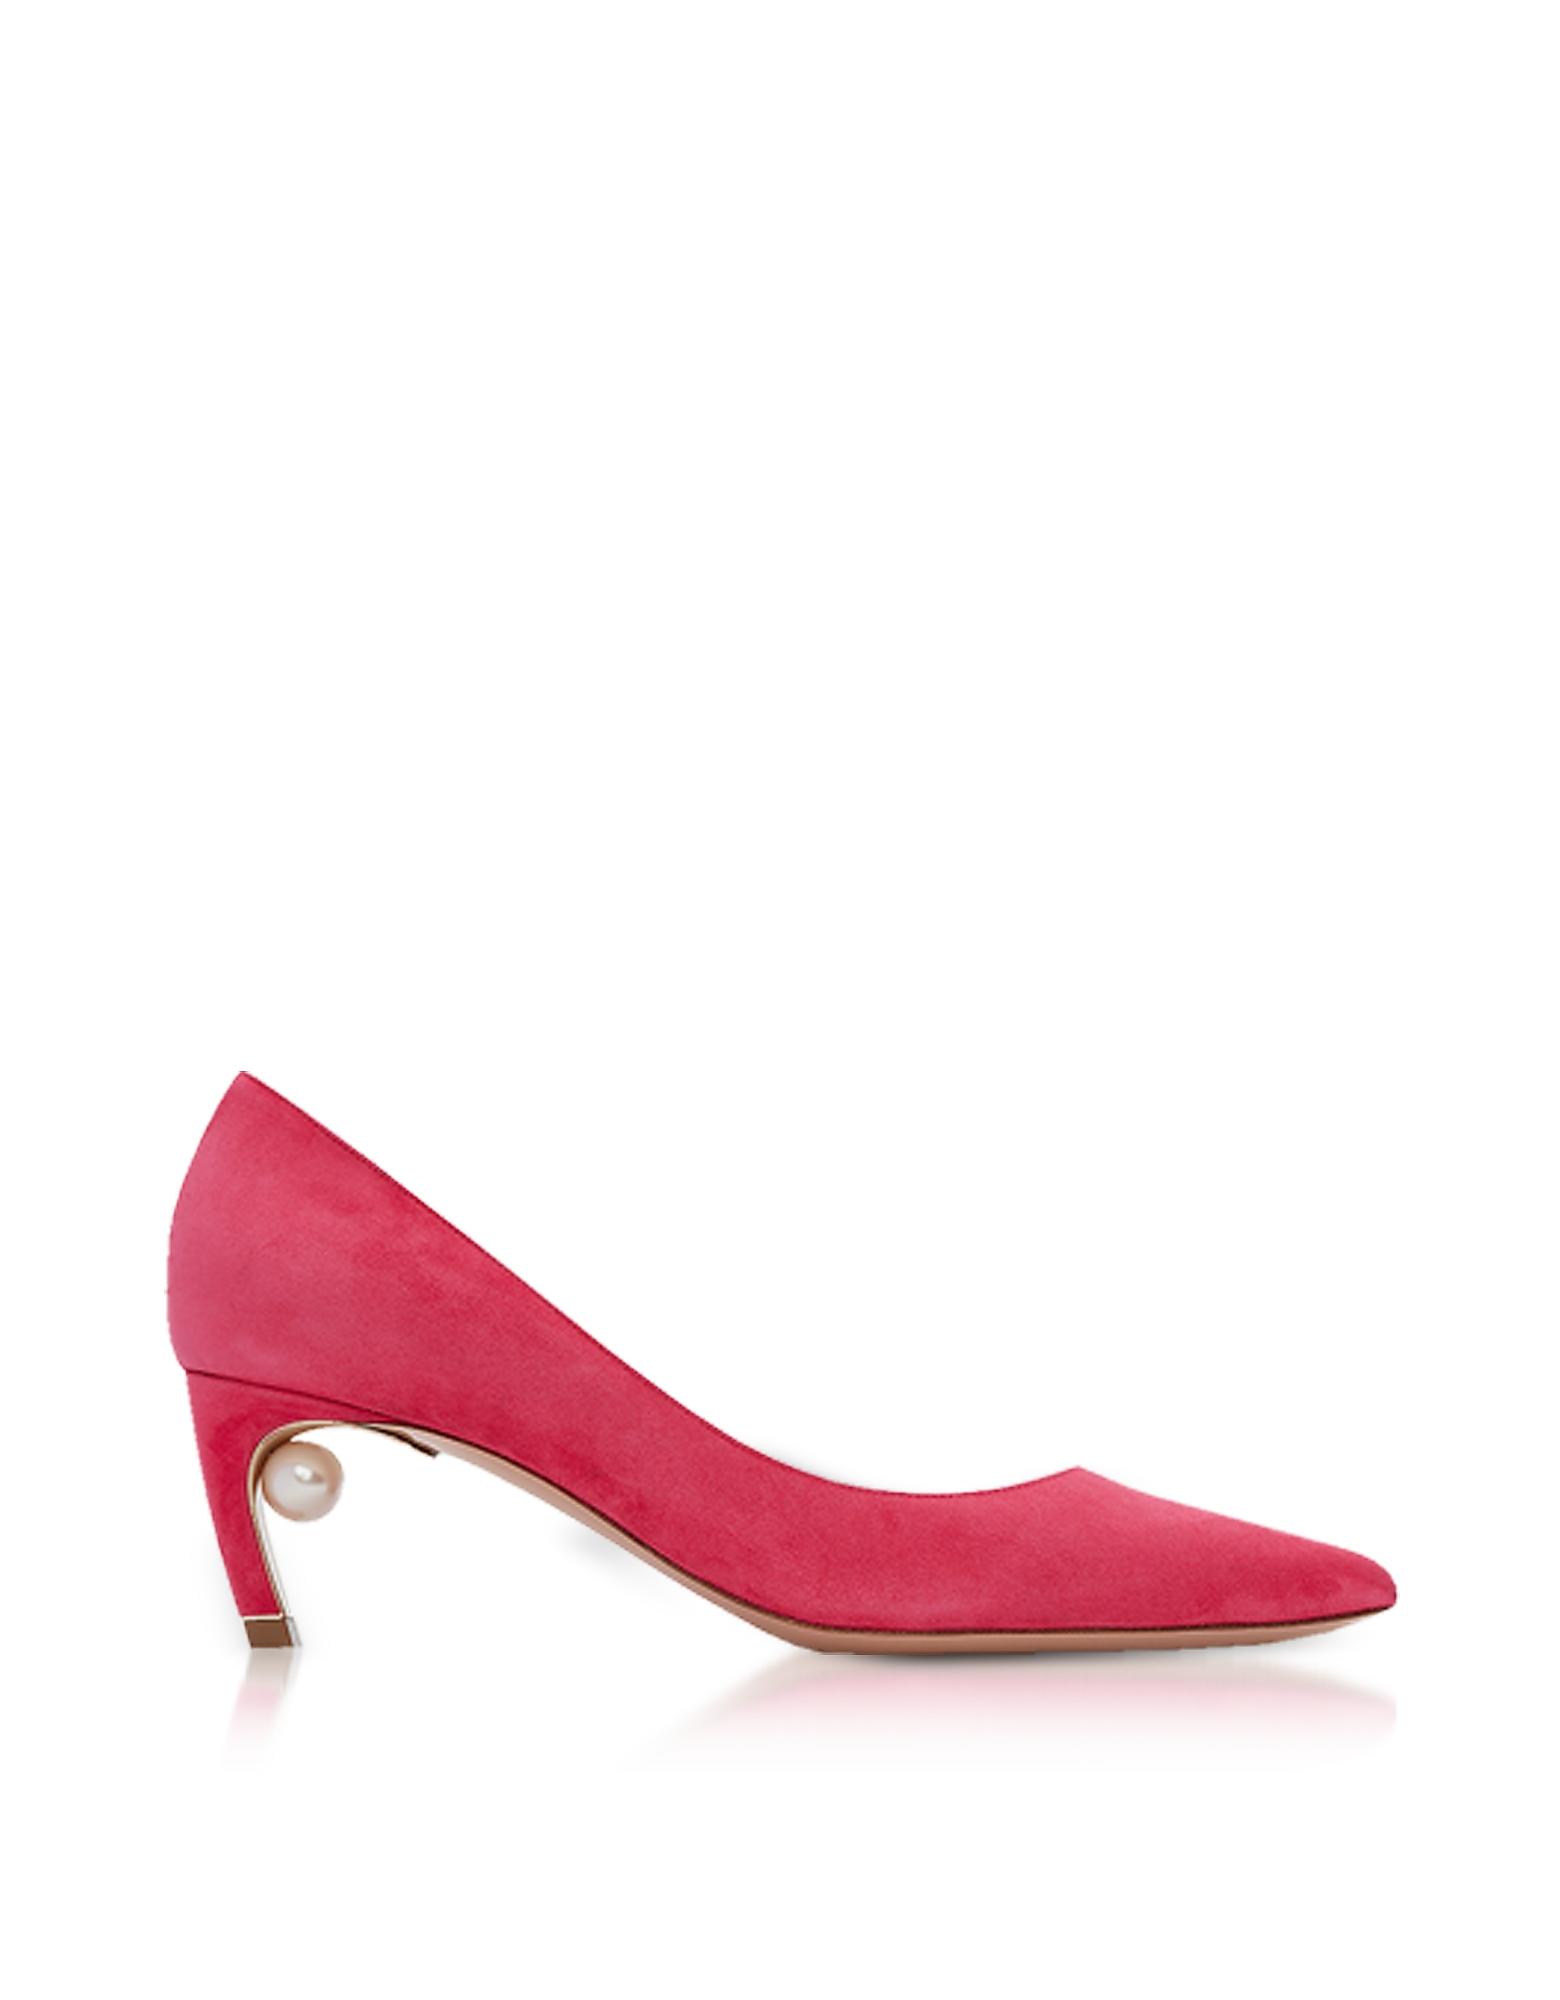 Nicholas Kirkwood Shoes, Fuxia Suede 55mm Mira Pearl Pumps